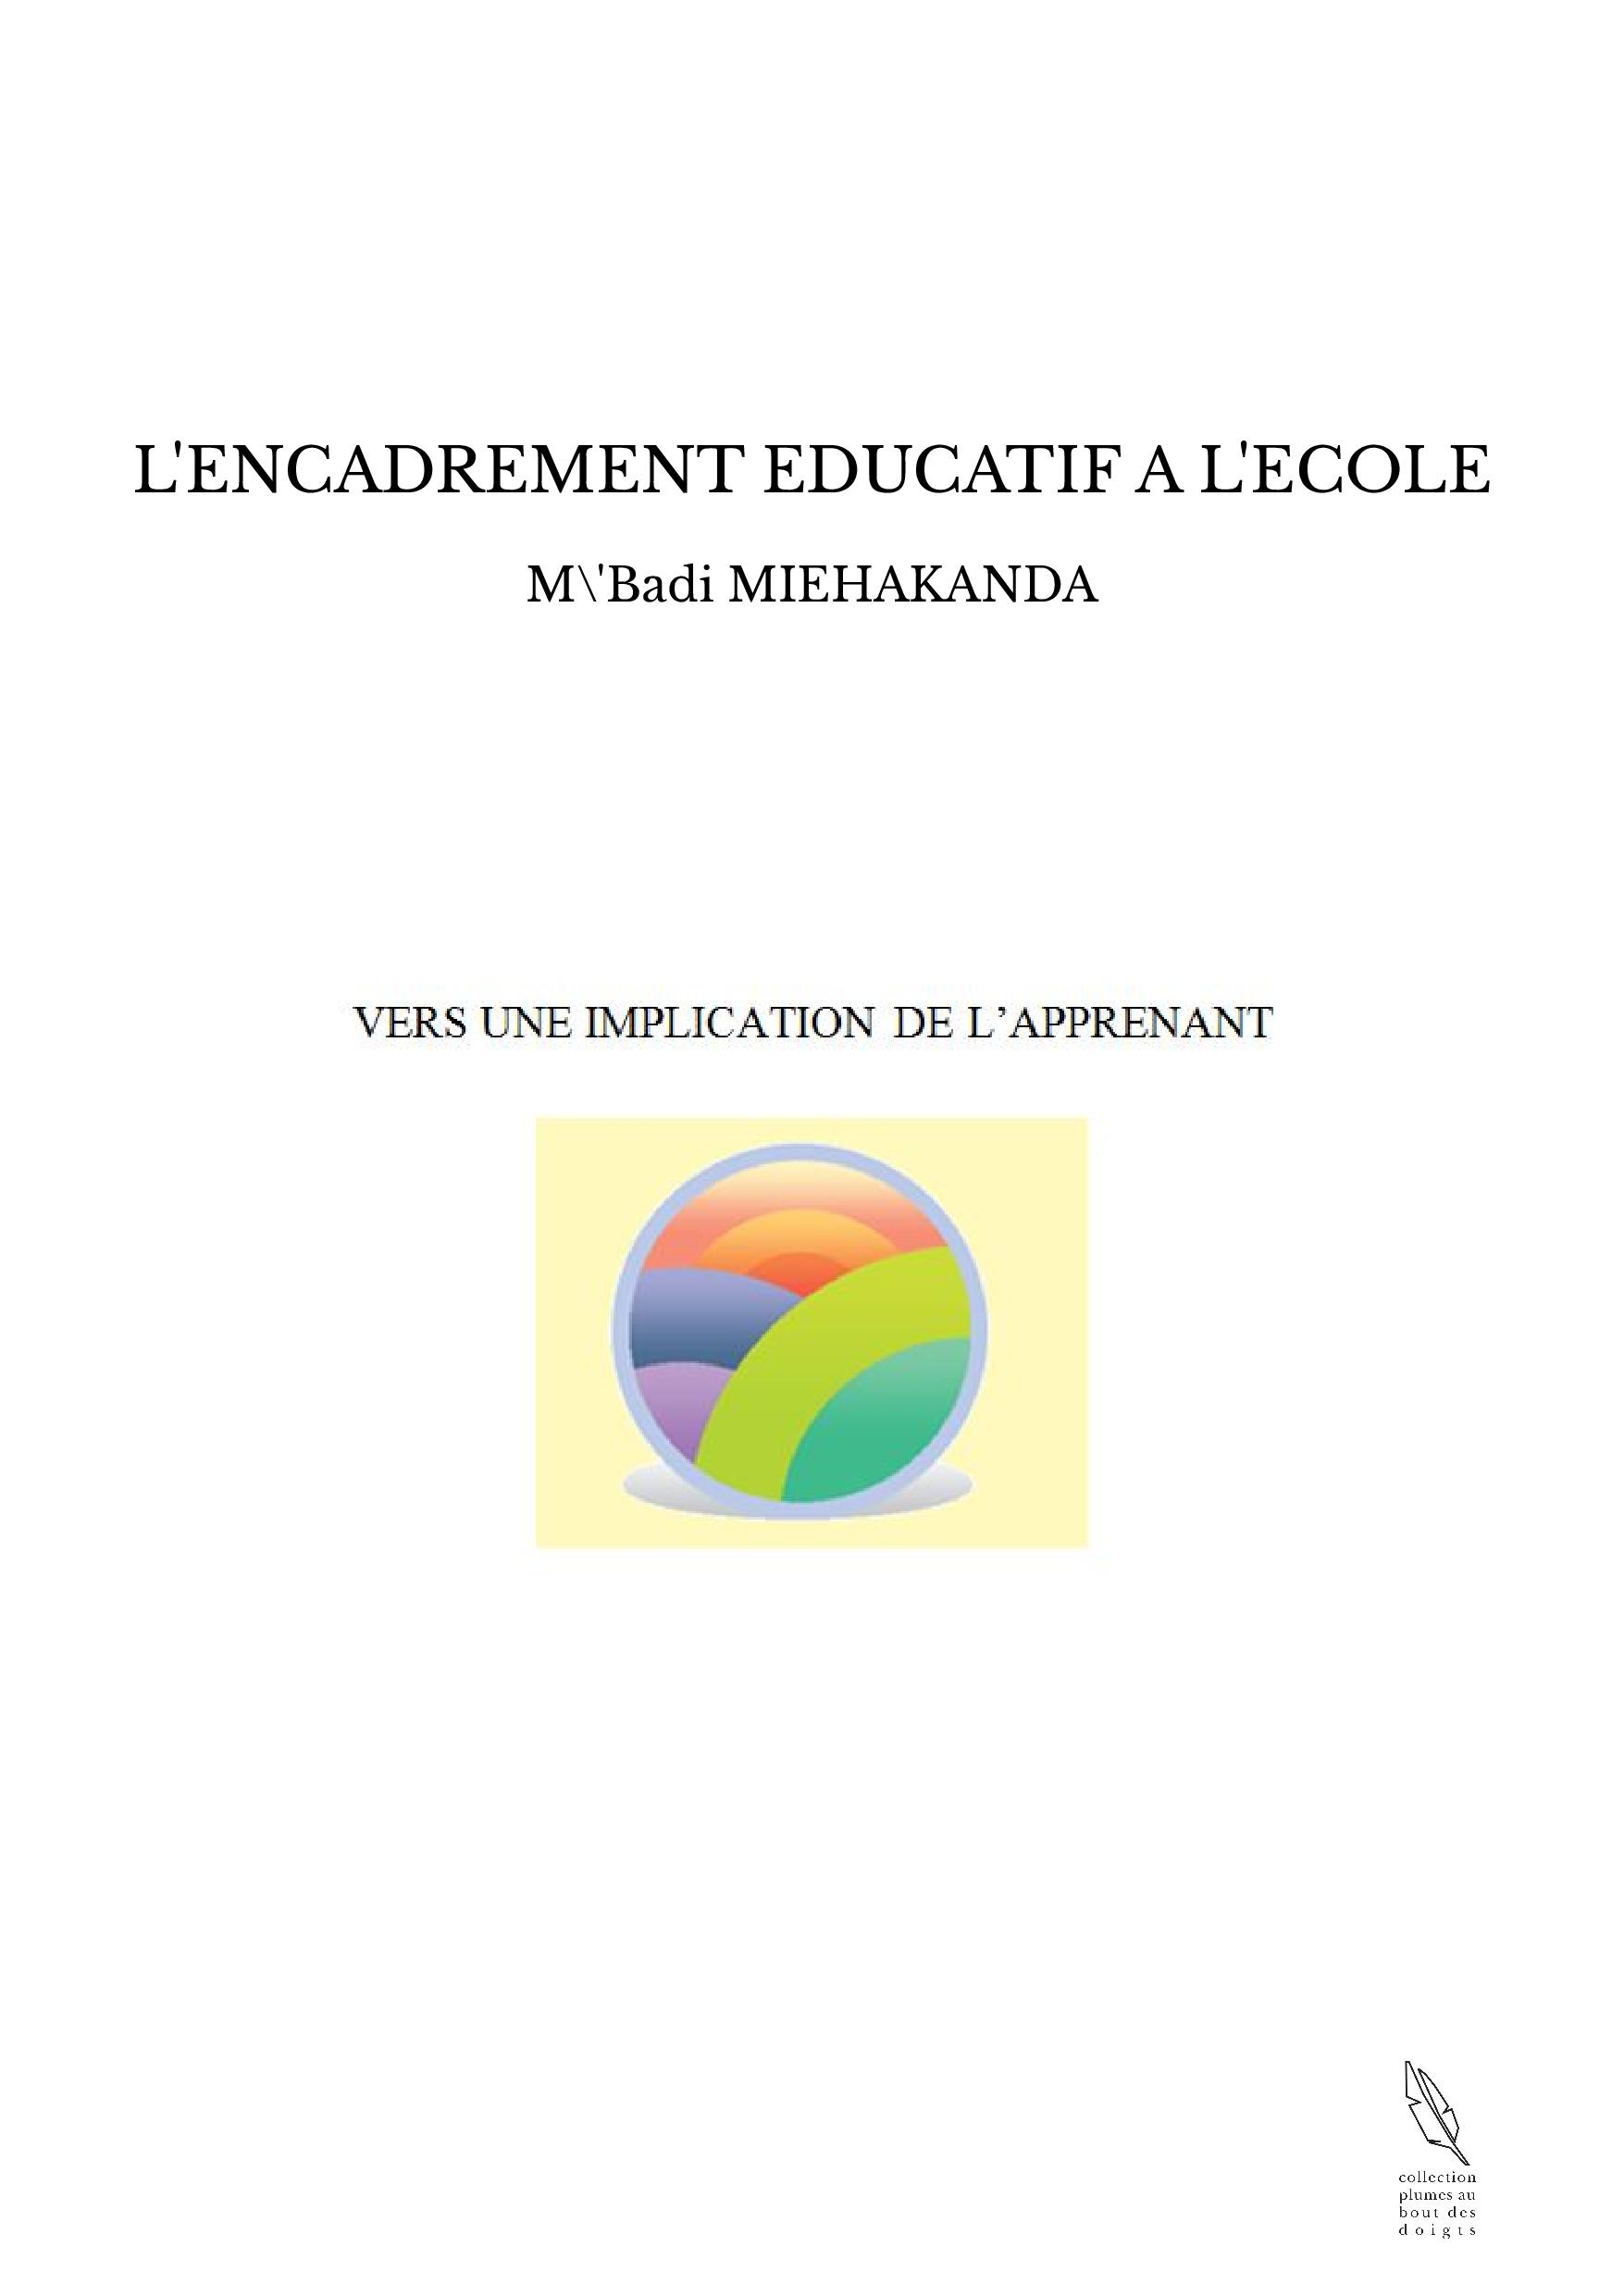 L'ENCADREMENT EDUCATIF A L'ECOLE